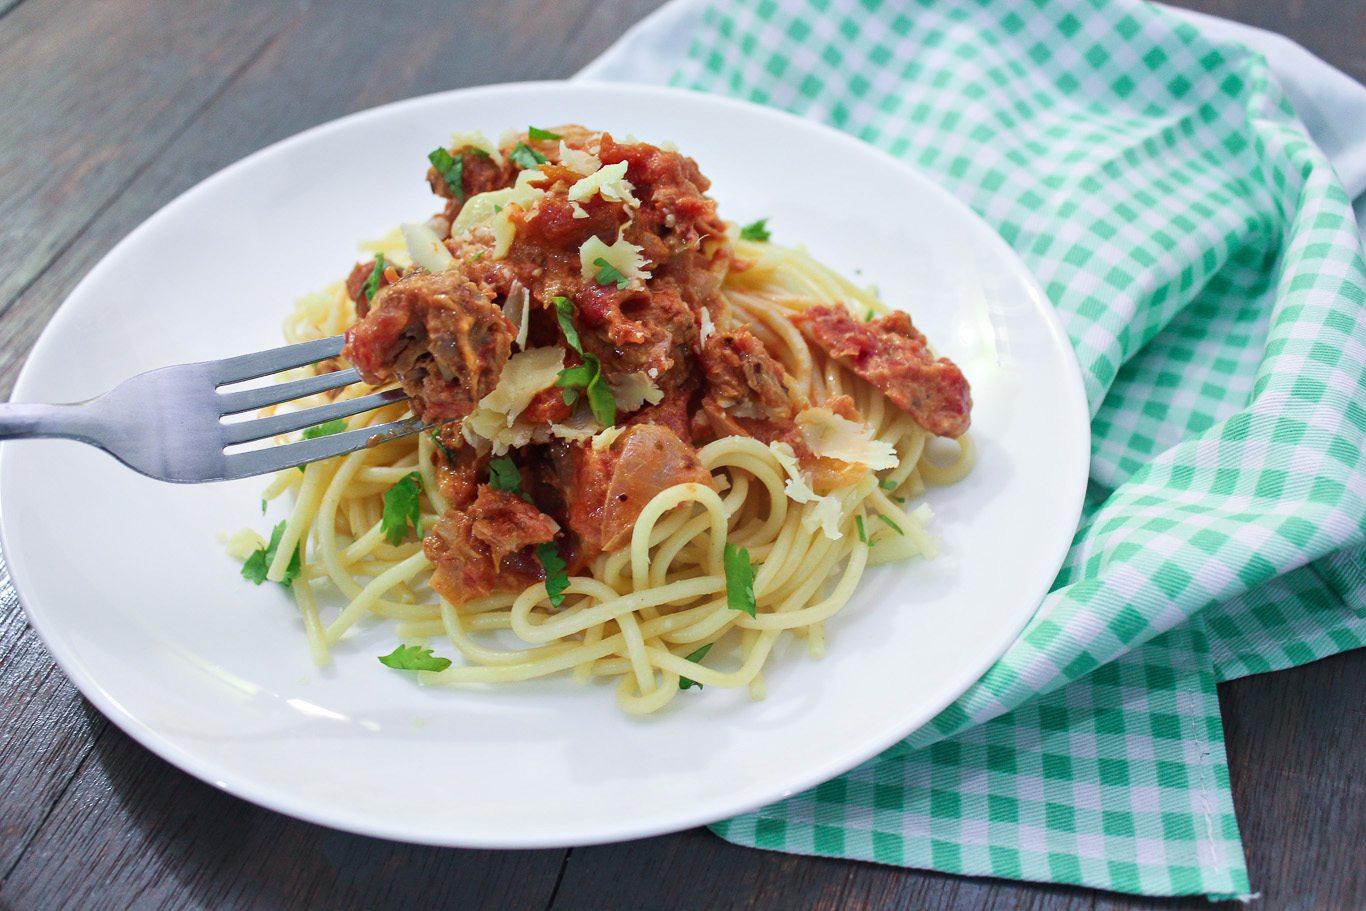 Pasta with Tuna and Tomato Cream Sauce - Maya Kitchenette